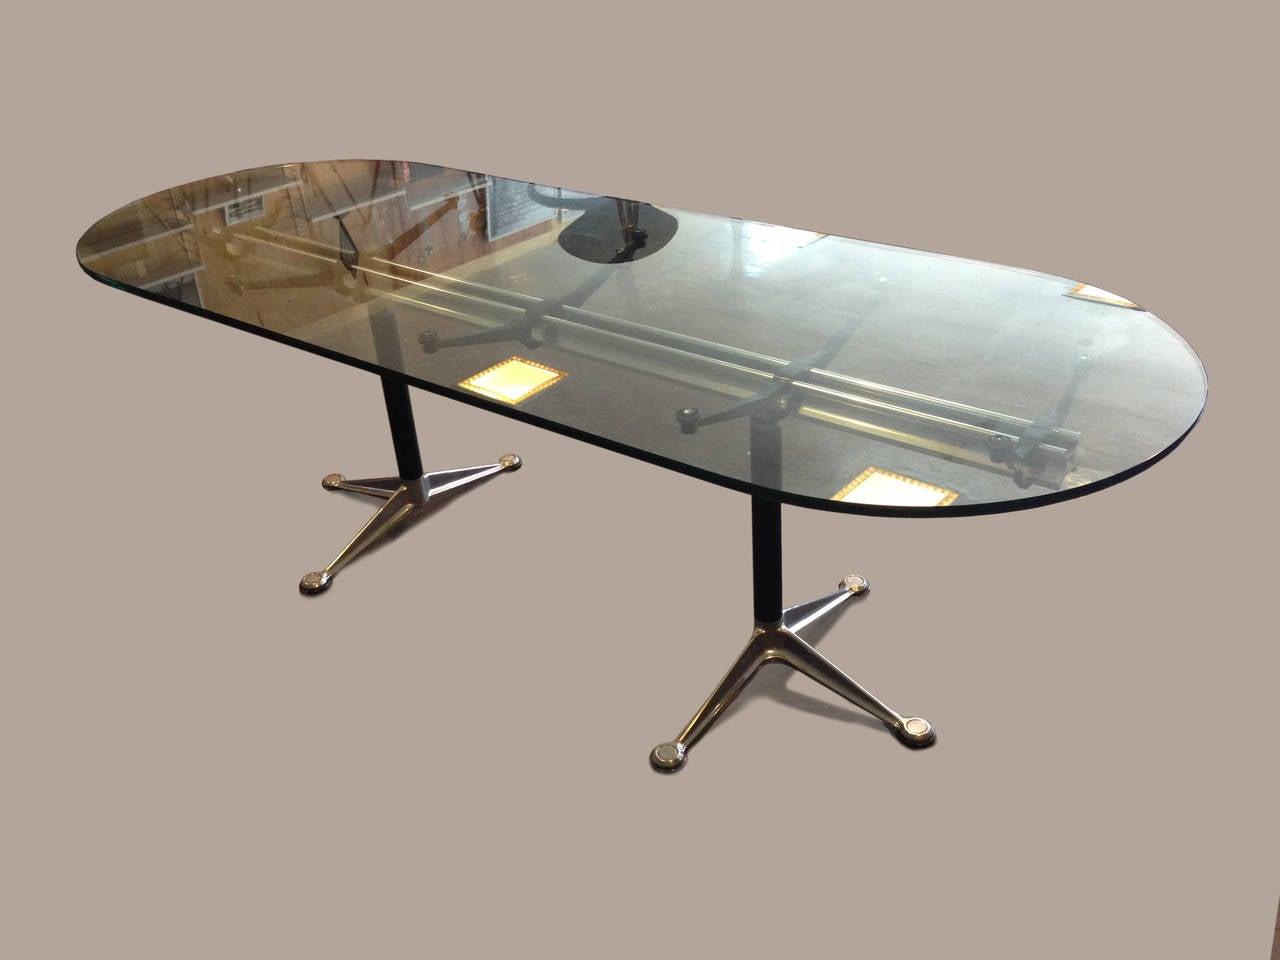 Bruce Burdick For Herman Miller Desk Or Dining Table At